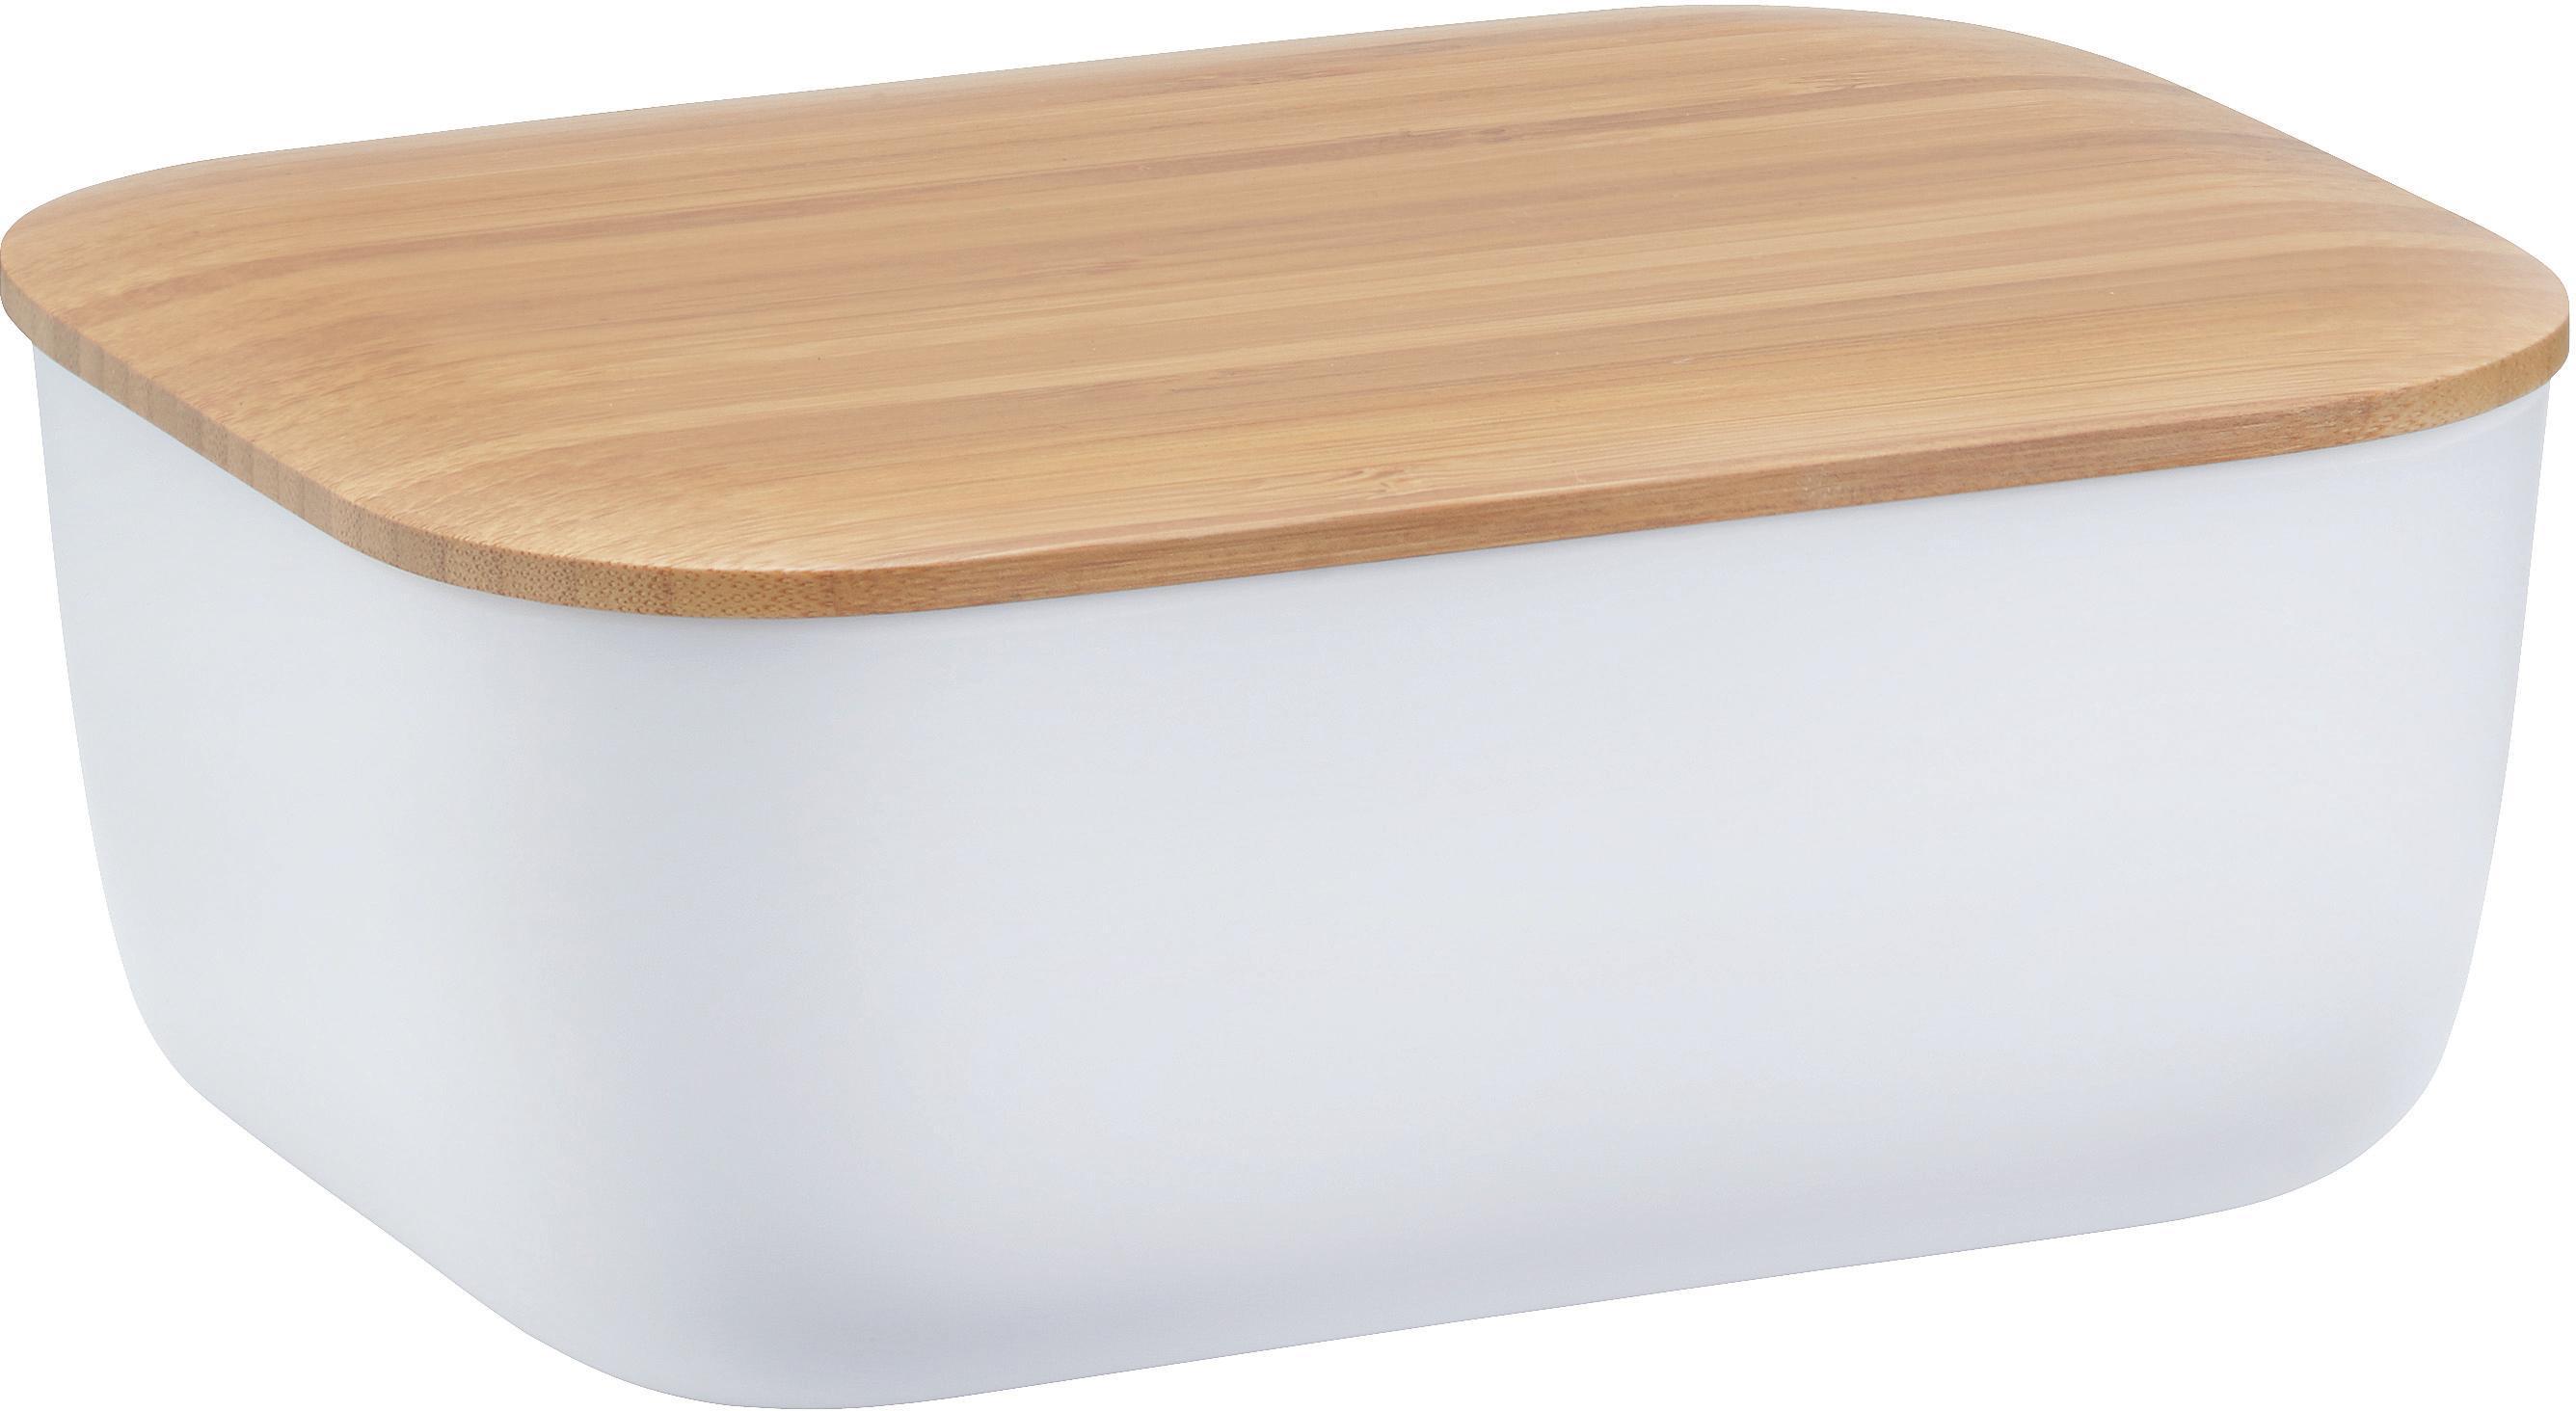 Burriera Box-It, Contenitore: melamina, Coperchio: bambù, Bianco, bambù, Larg. 15 x Alt. 7 cm